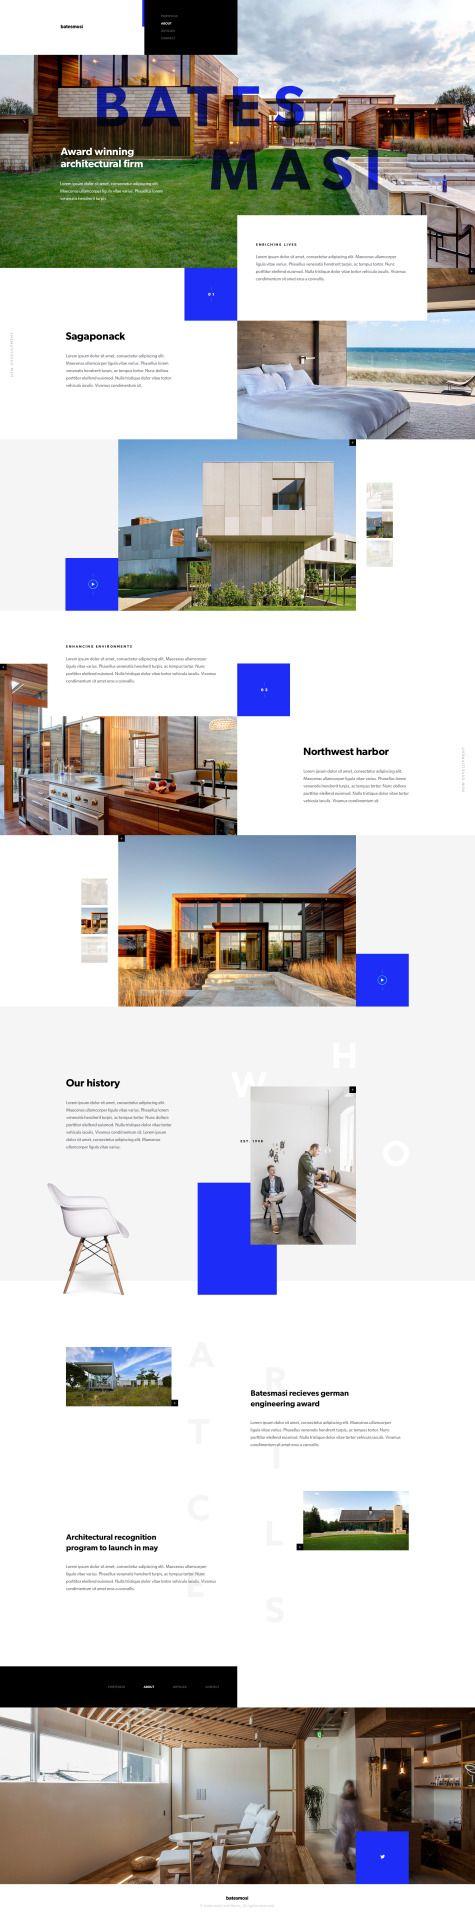 760 Best Pixels Web UI Design Images On Pinterest